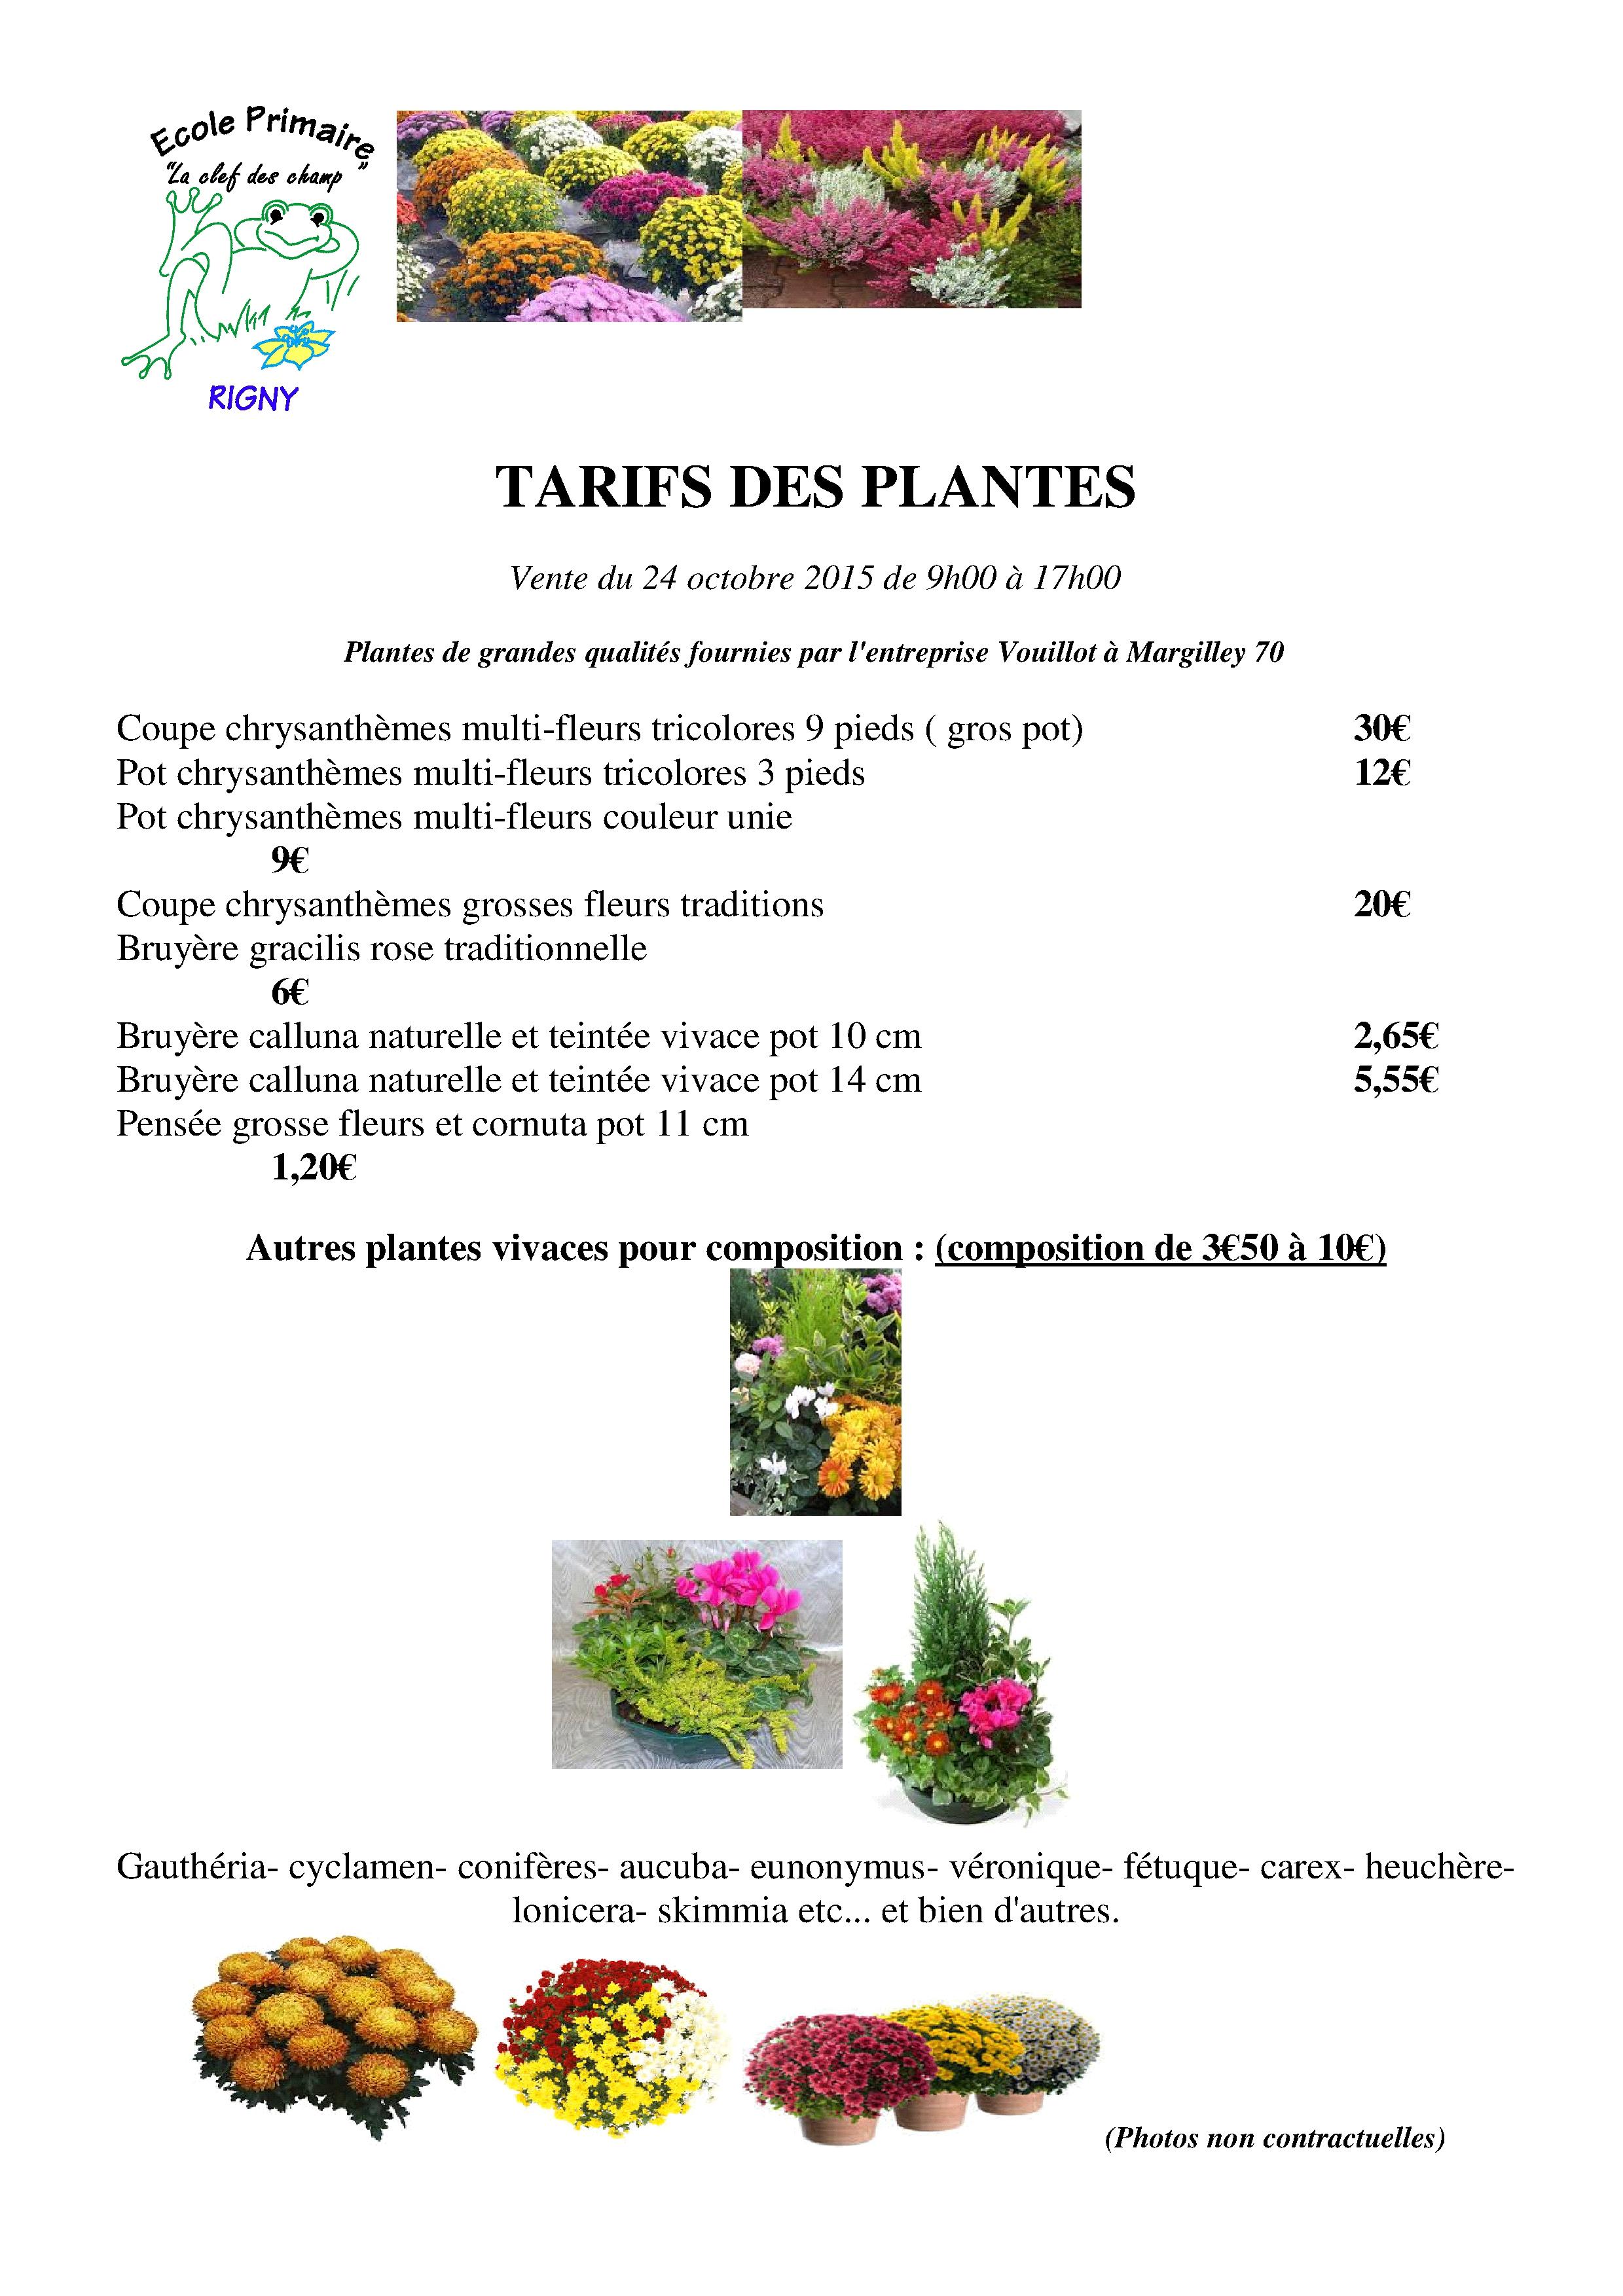 La clef des champs grande vente de plantes de la for Vente de plantes